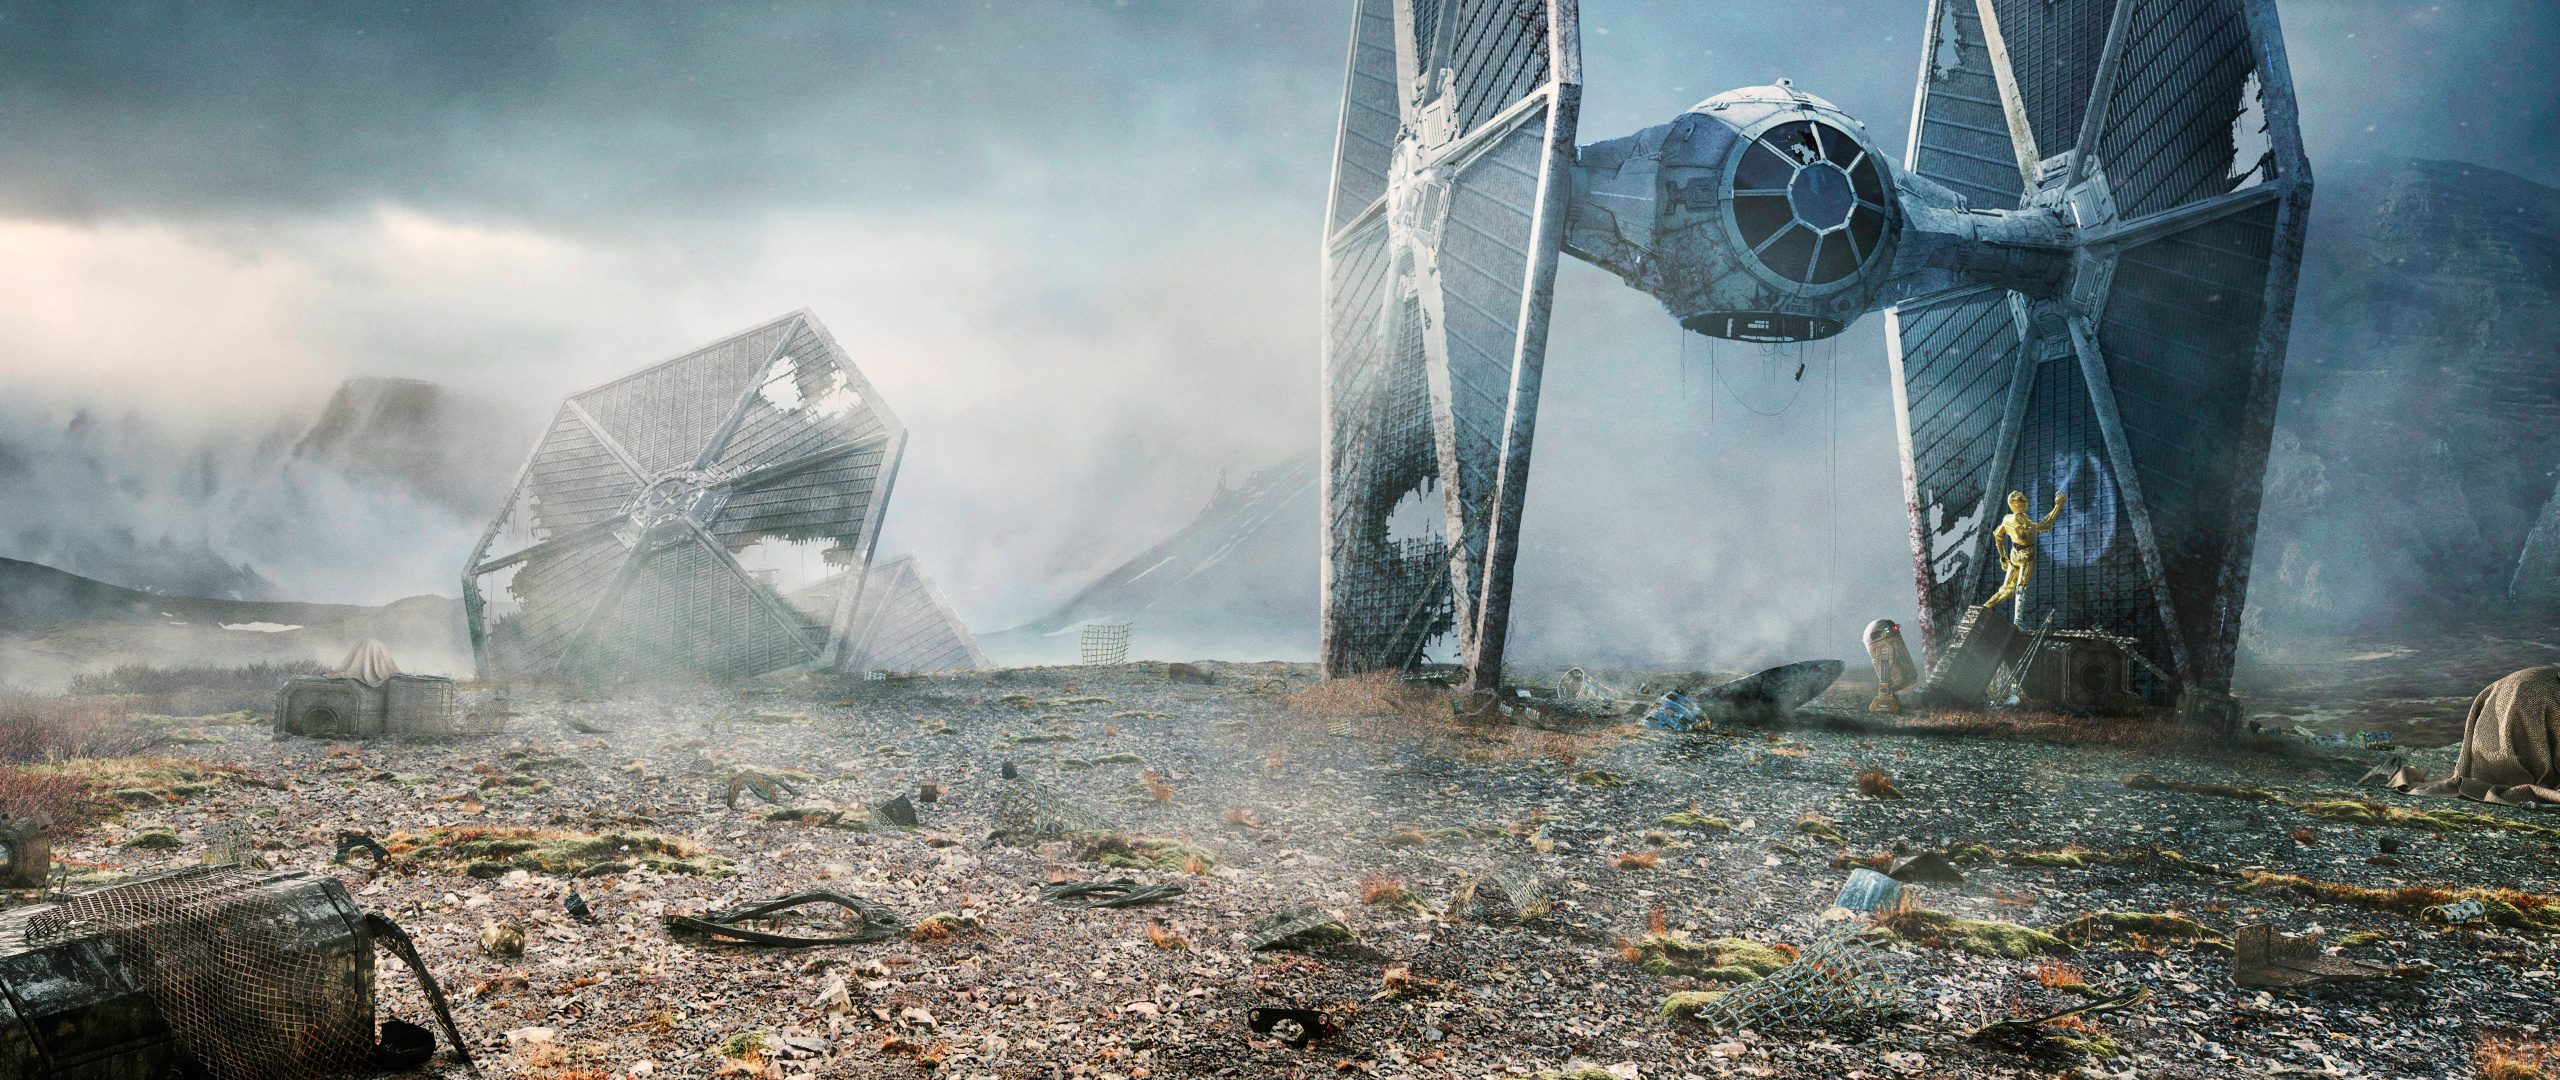 Star Wars Ultrawide Wallpaper: Wallpaper 2560x1080